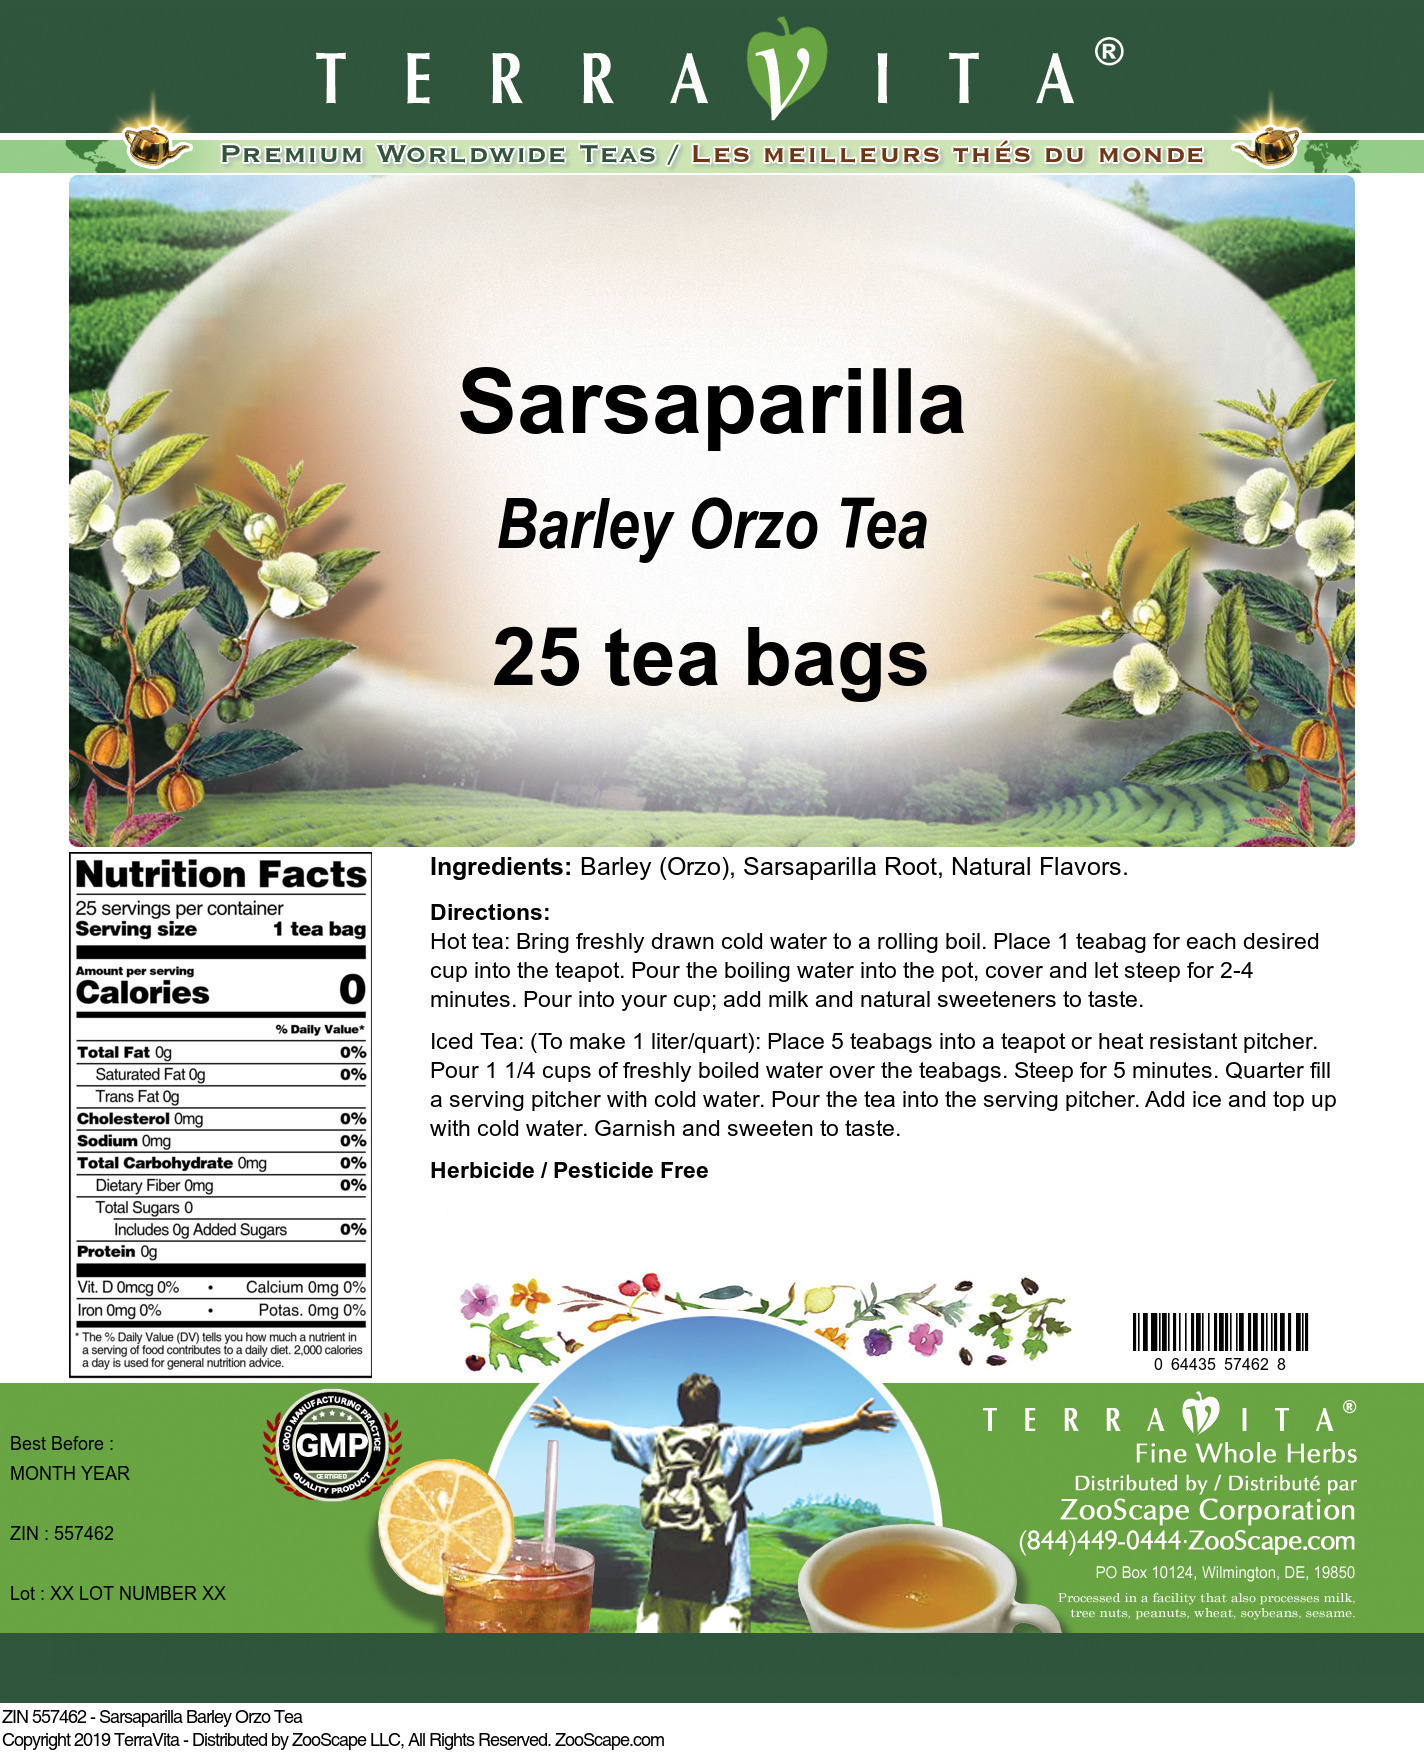 Sarsaparilla Barley Orzo